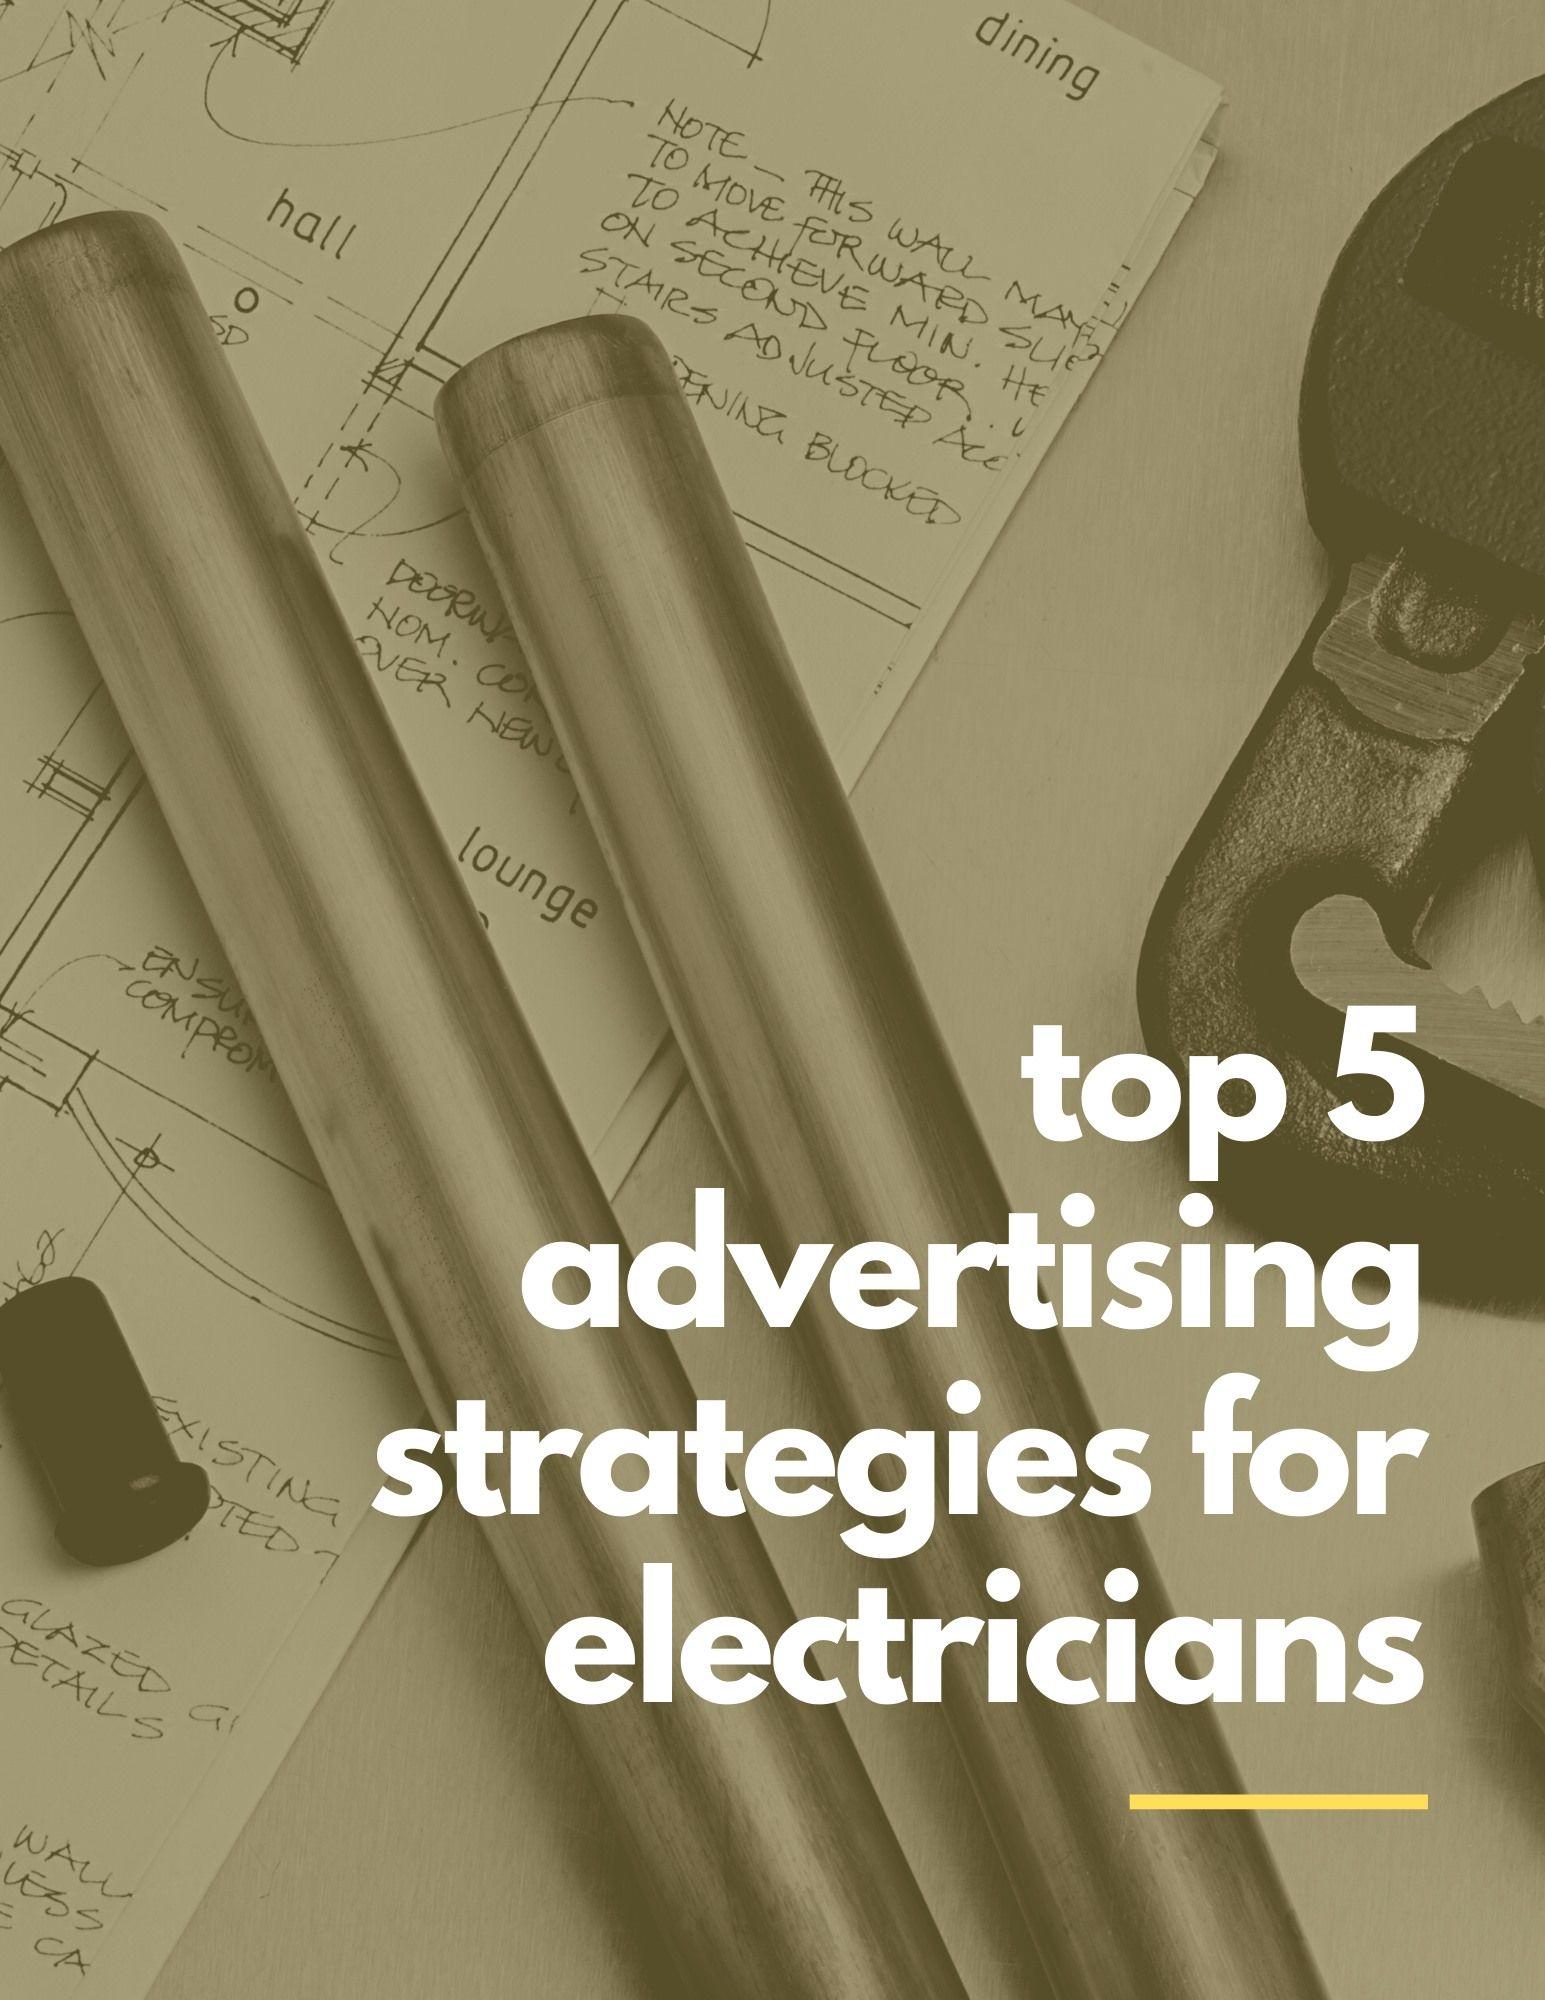 Electrician advertising 5 top lead generation strategies